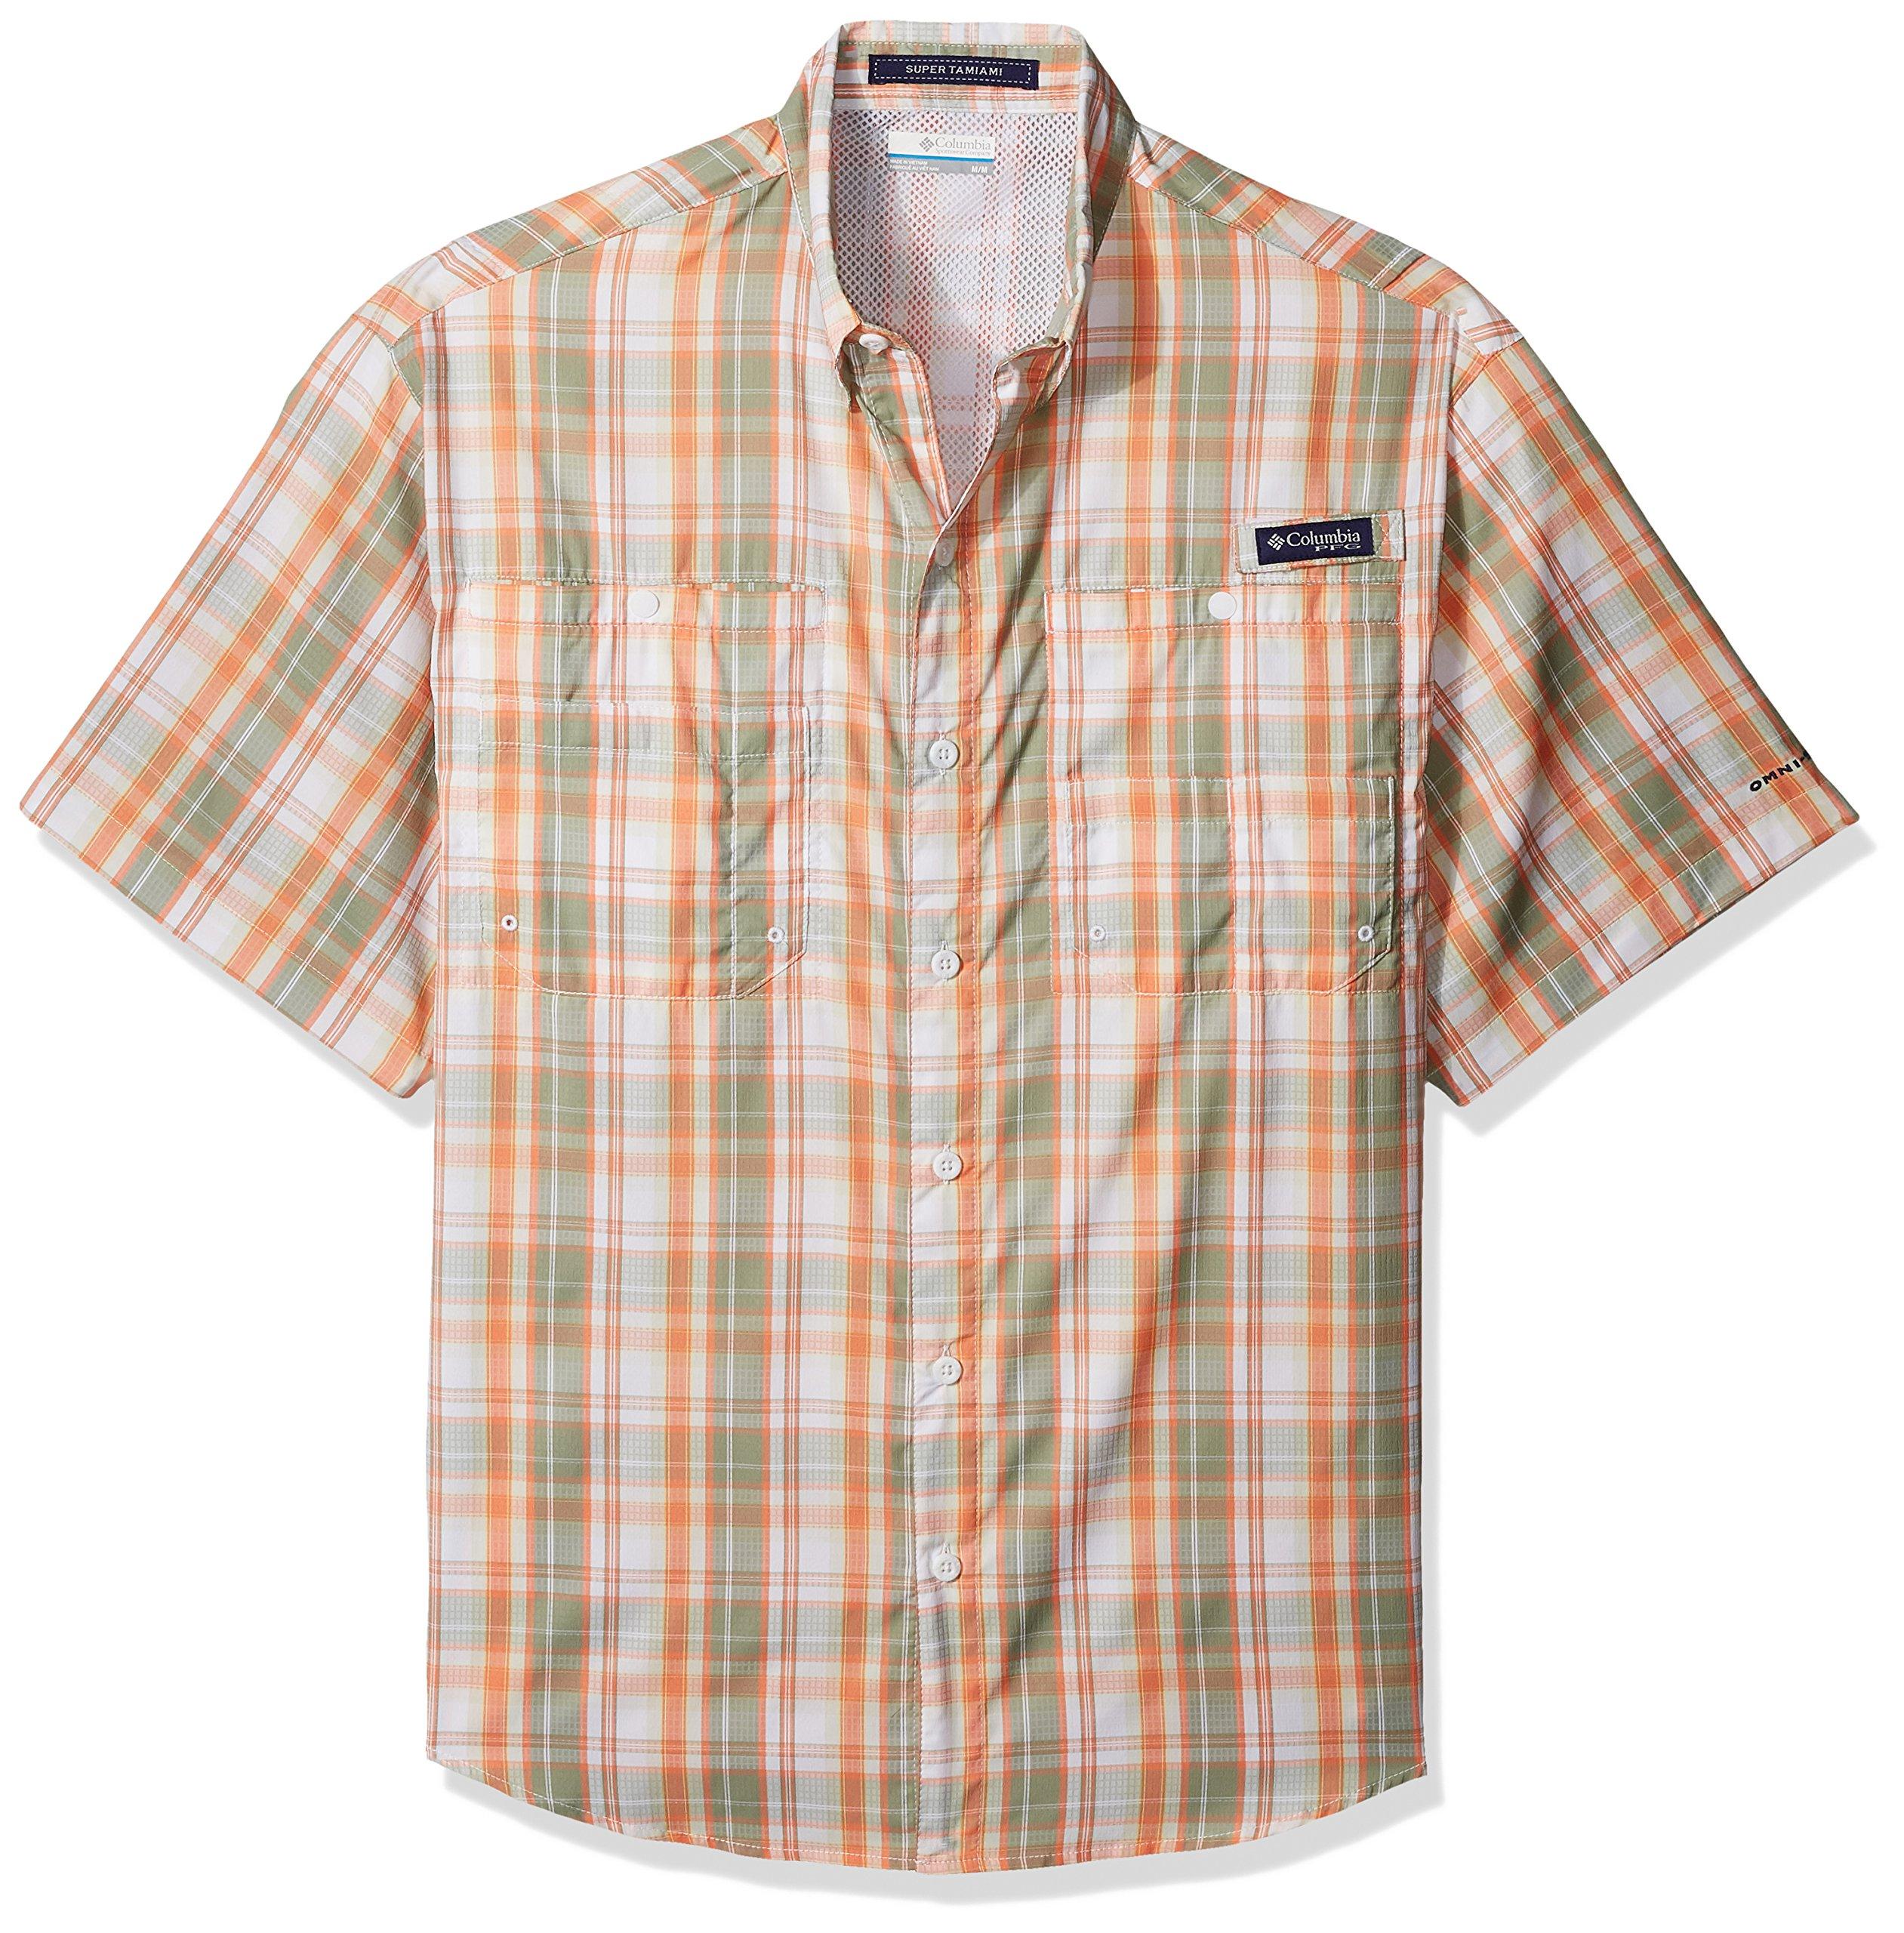 magellan angler fit fishing shirt - HD2522×2560